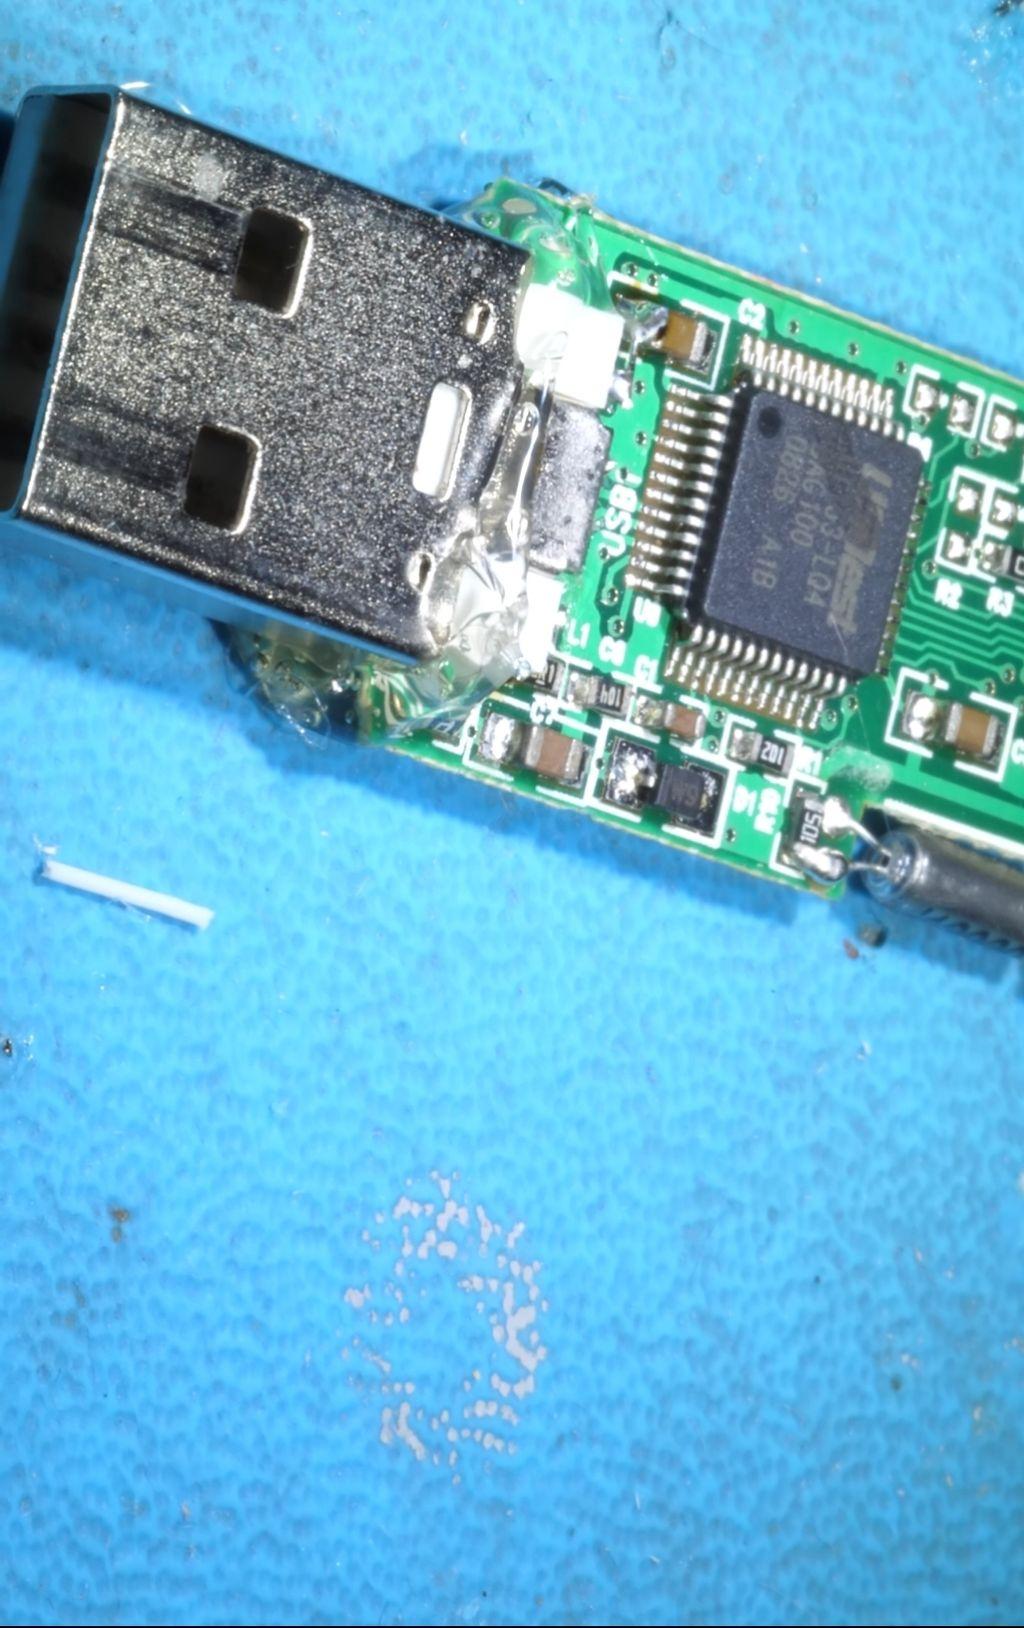 Broken Flash Drive